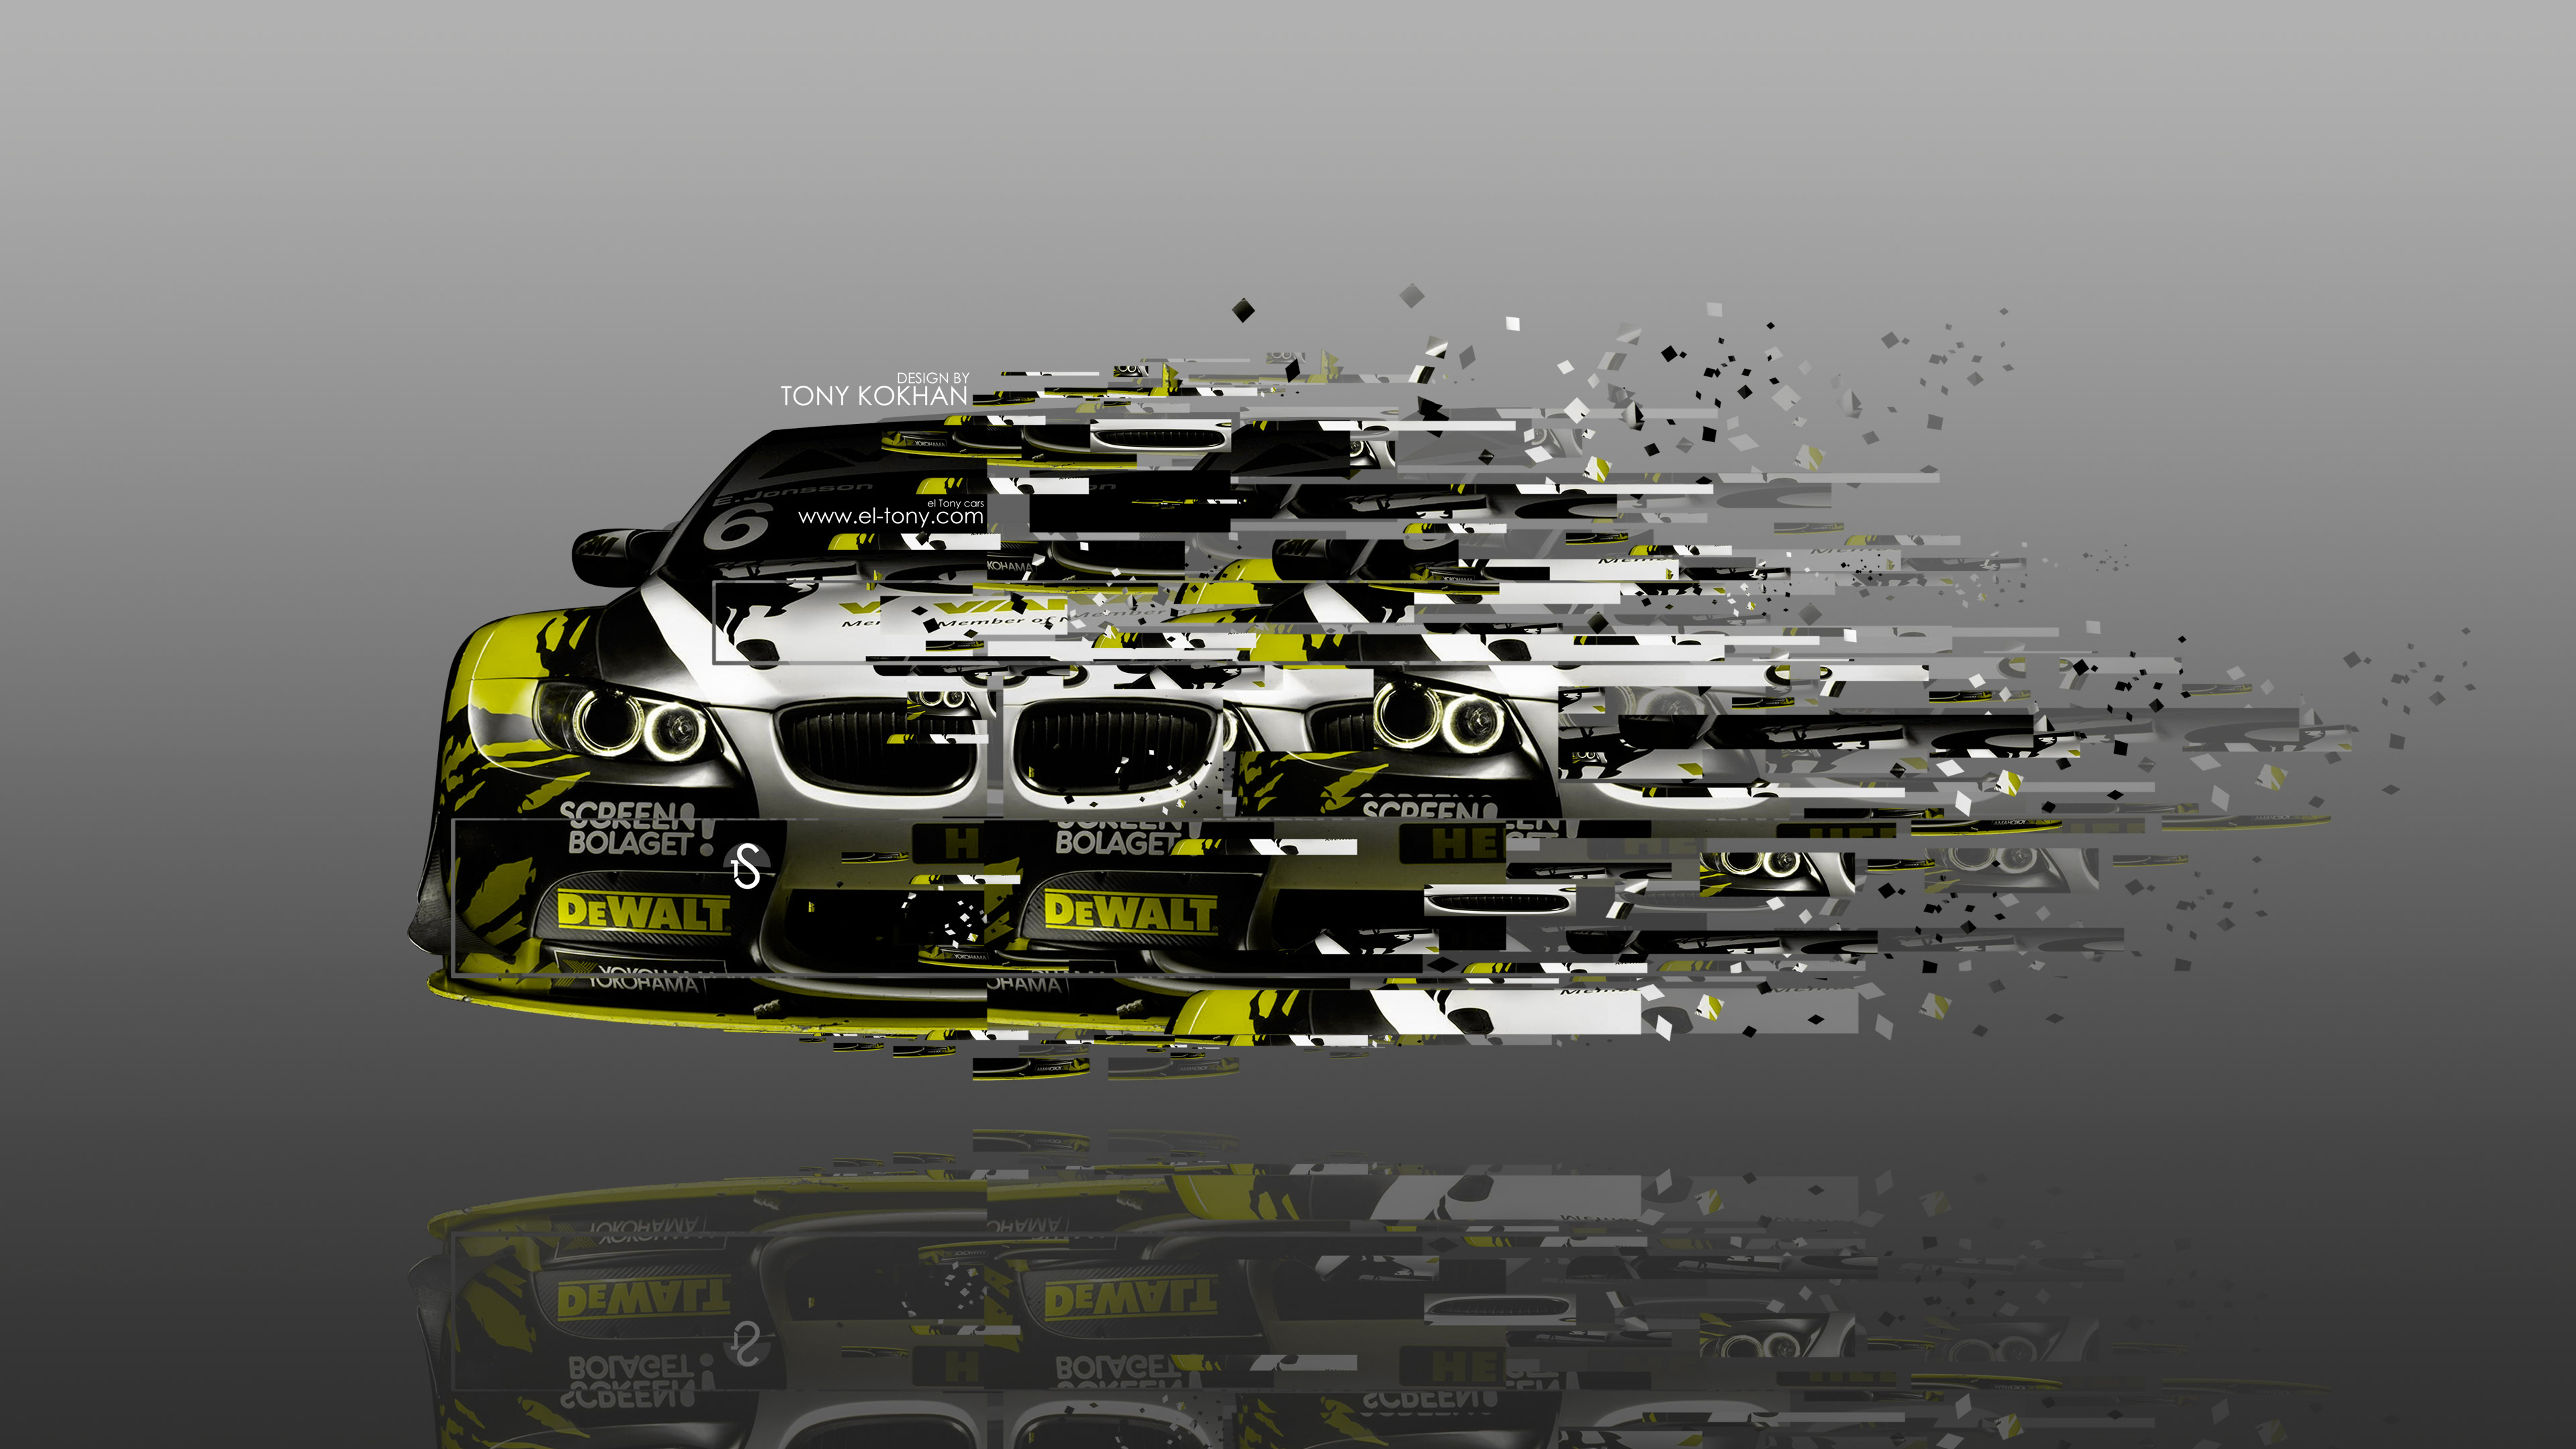 4K BMW M3 E92 Tuning Front Fantasy Transkinetiks Car 2014 el Tony 3840x2160